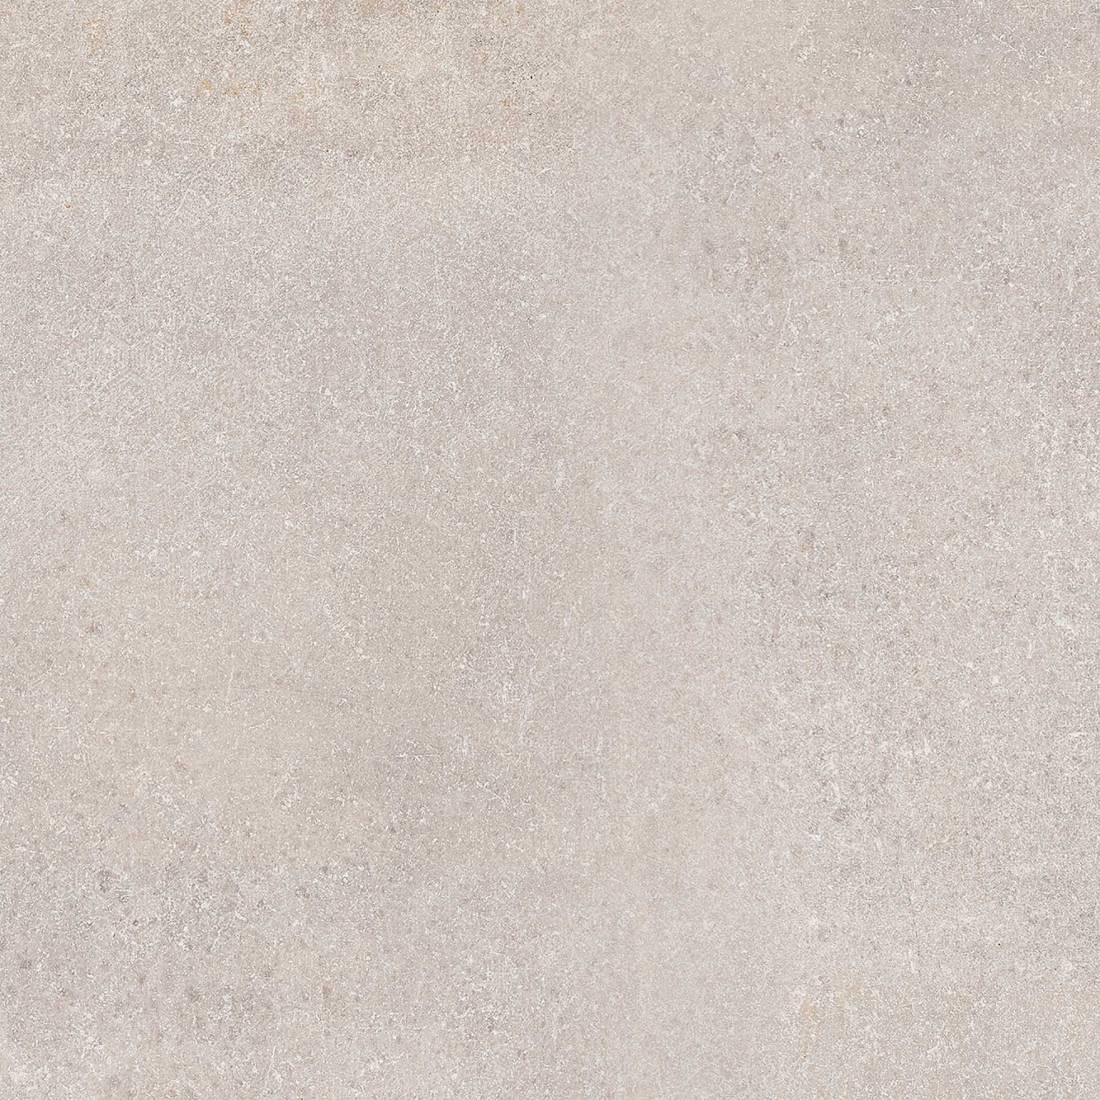 Auckland 33.3x33.3 Grey 1